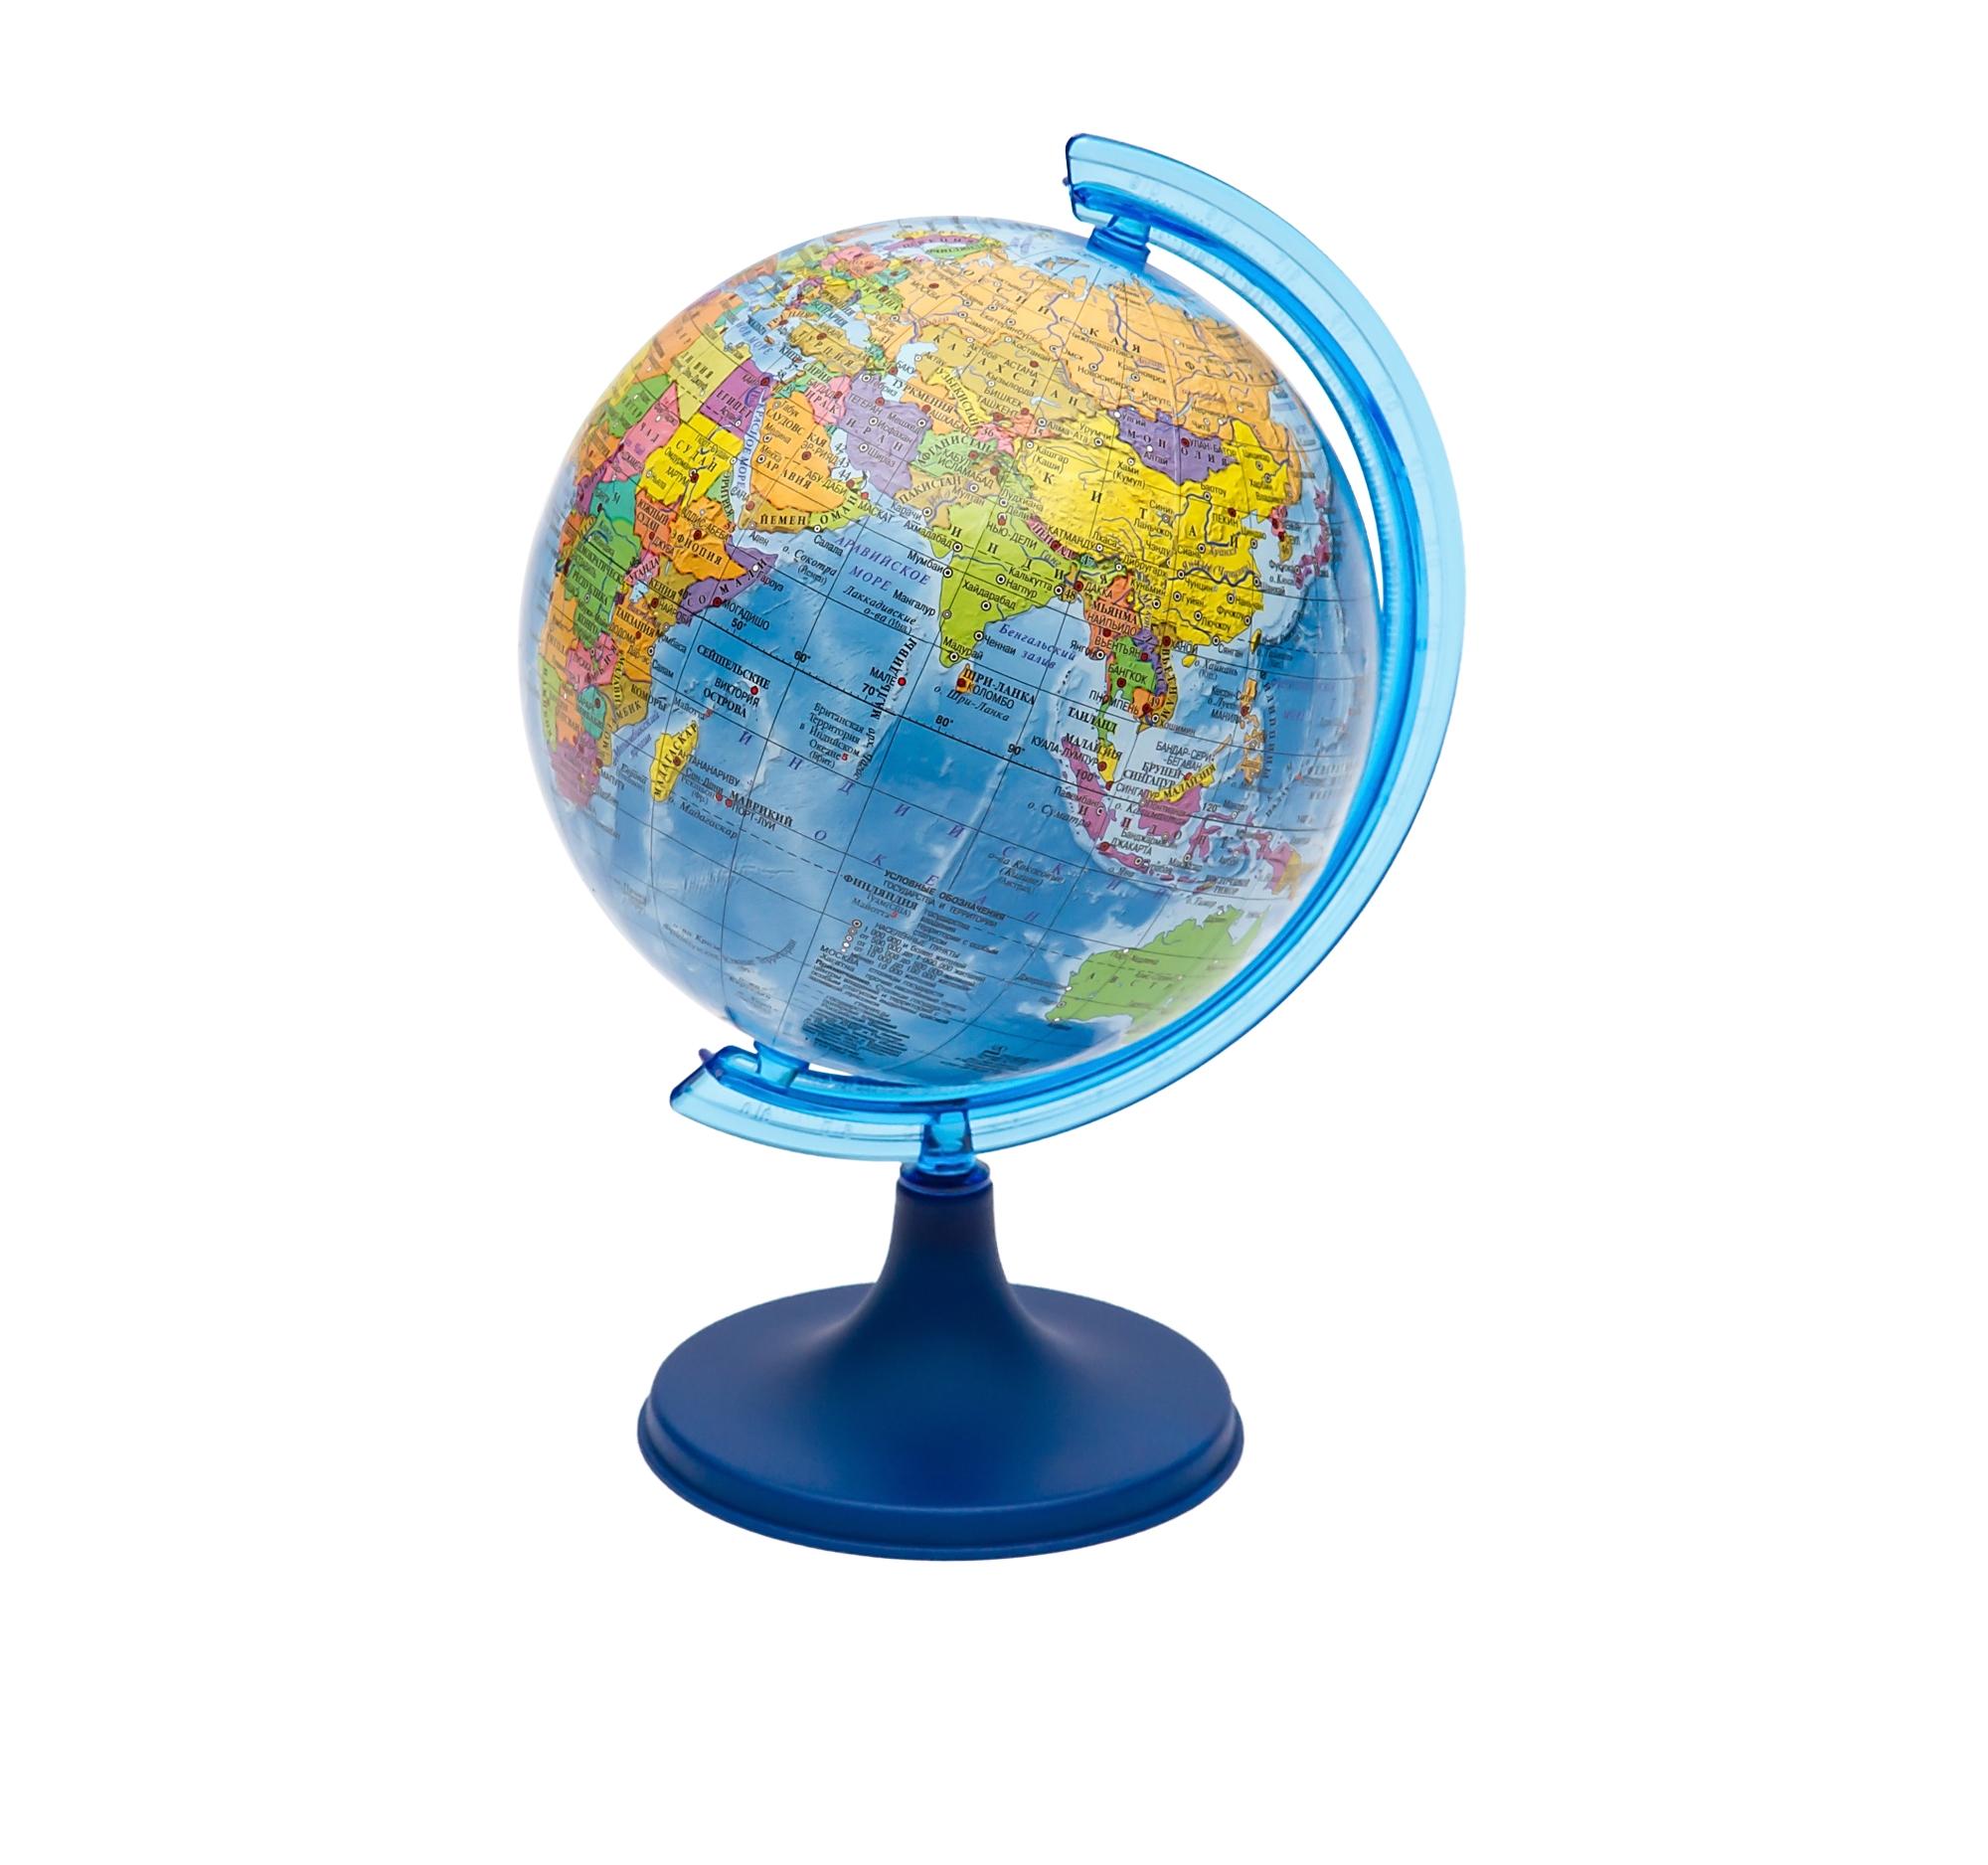 глобус и карта презентация картинки будущий актер